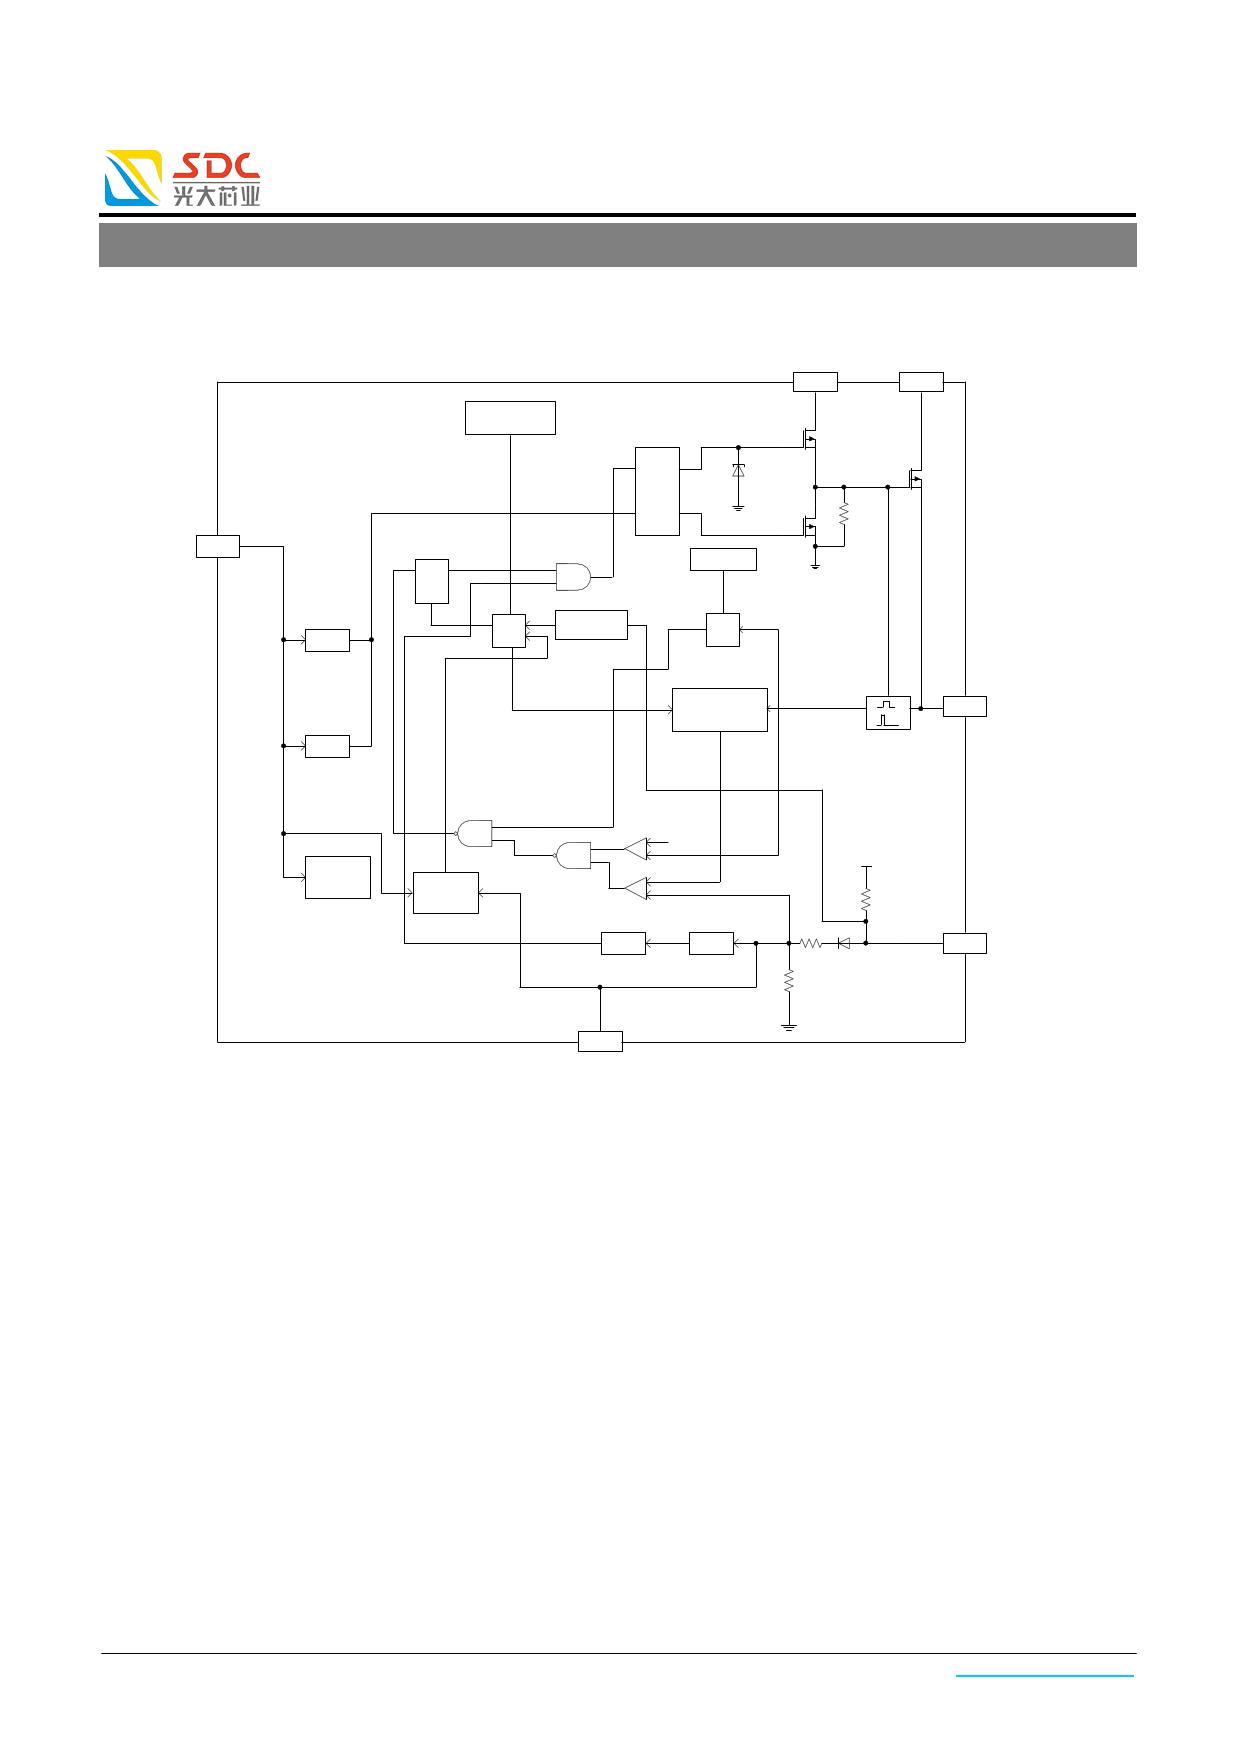 Switch Mode Power Supply Block Diagram Pdf Wiring And Ebooks Switchingpowersupplyblockdiagram Switching Sdc3110 Fiche Technique Datasheet Sdc Circuit